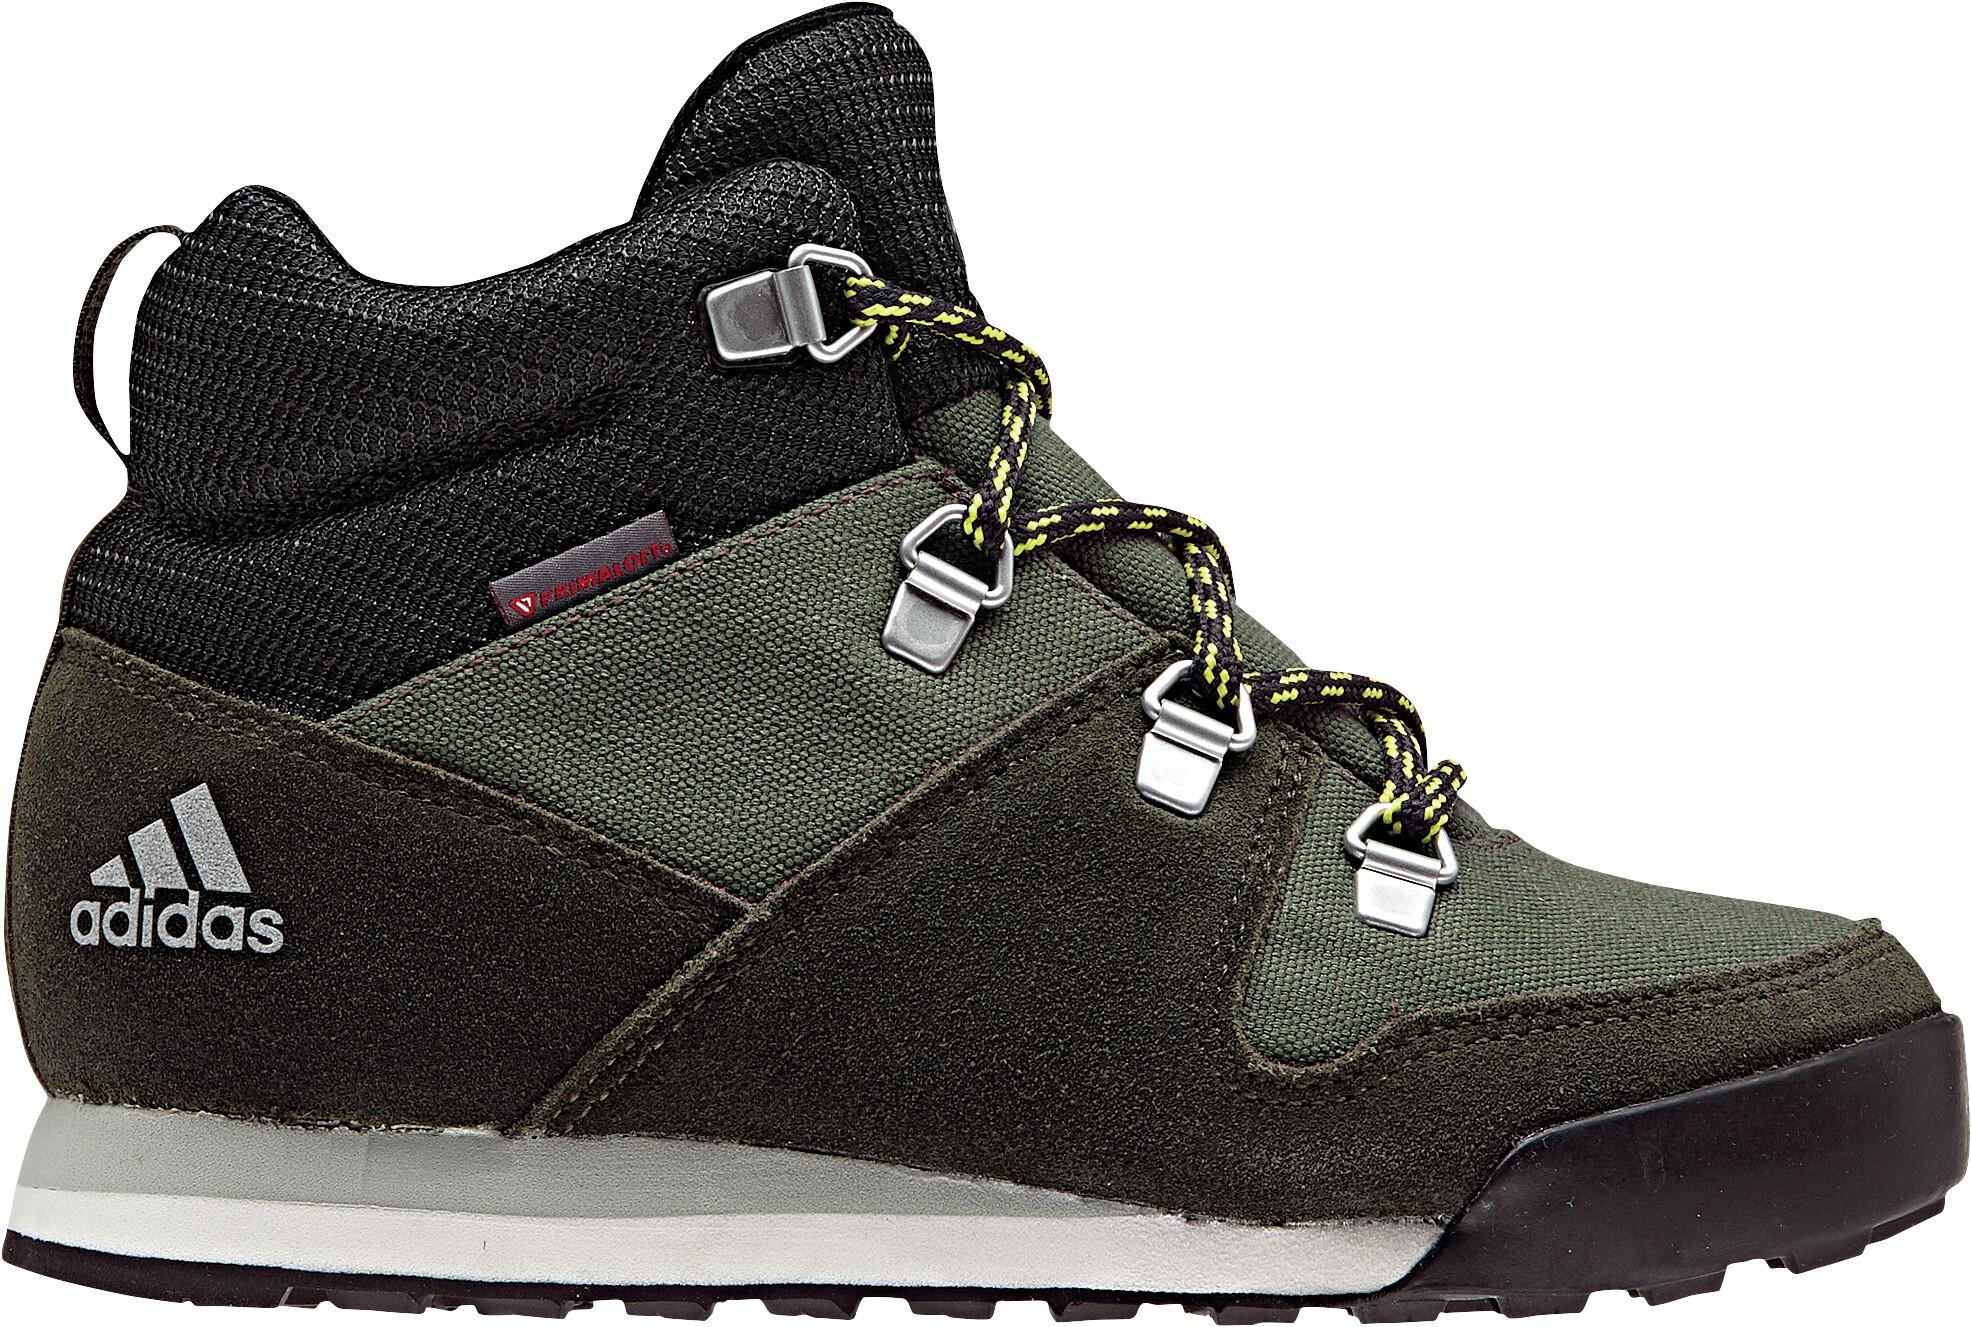 huge discount 49d32 1a7c6 adidas TERREX SnowPitch Winter Shoes Boys Base Green Night Cargo Ash Silver.jpg